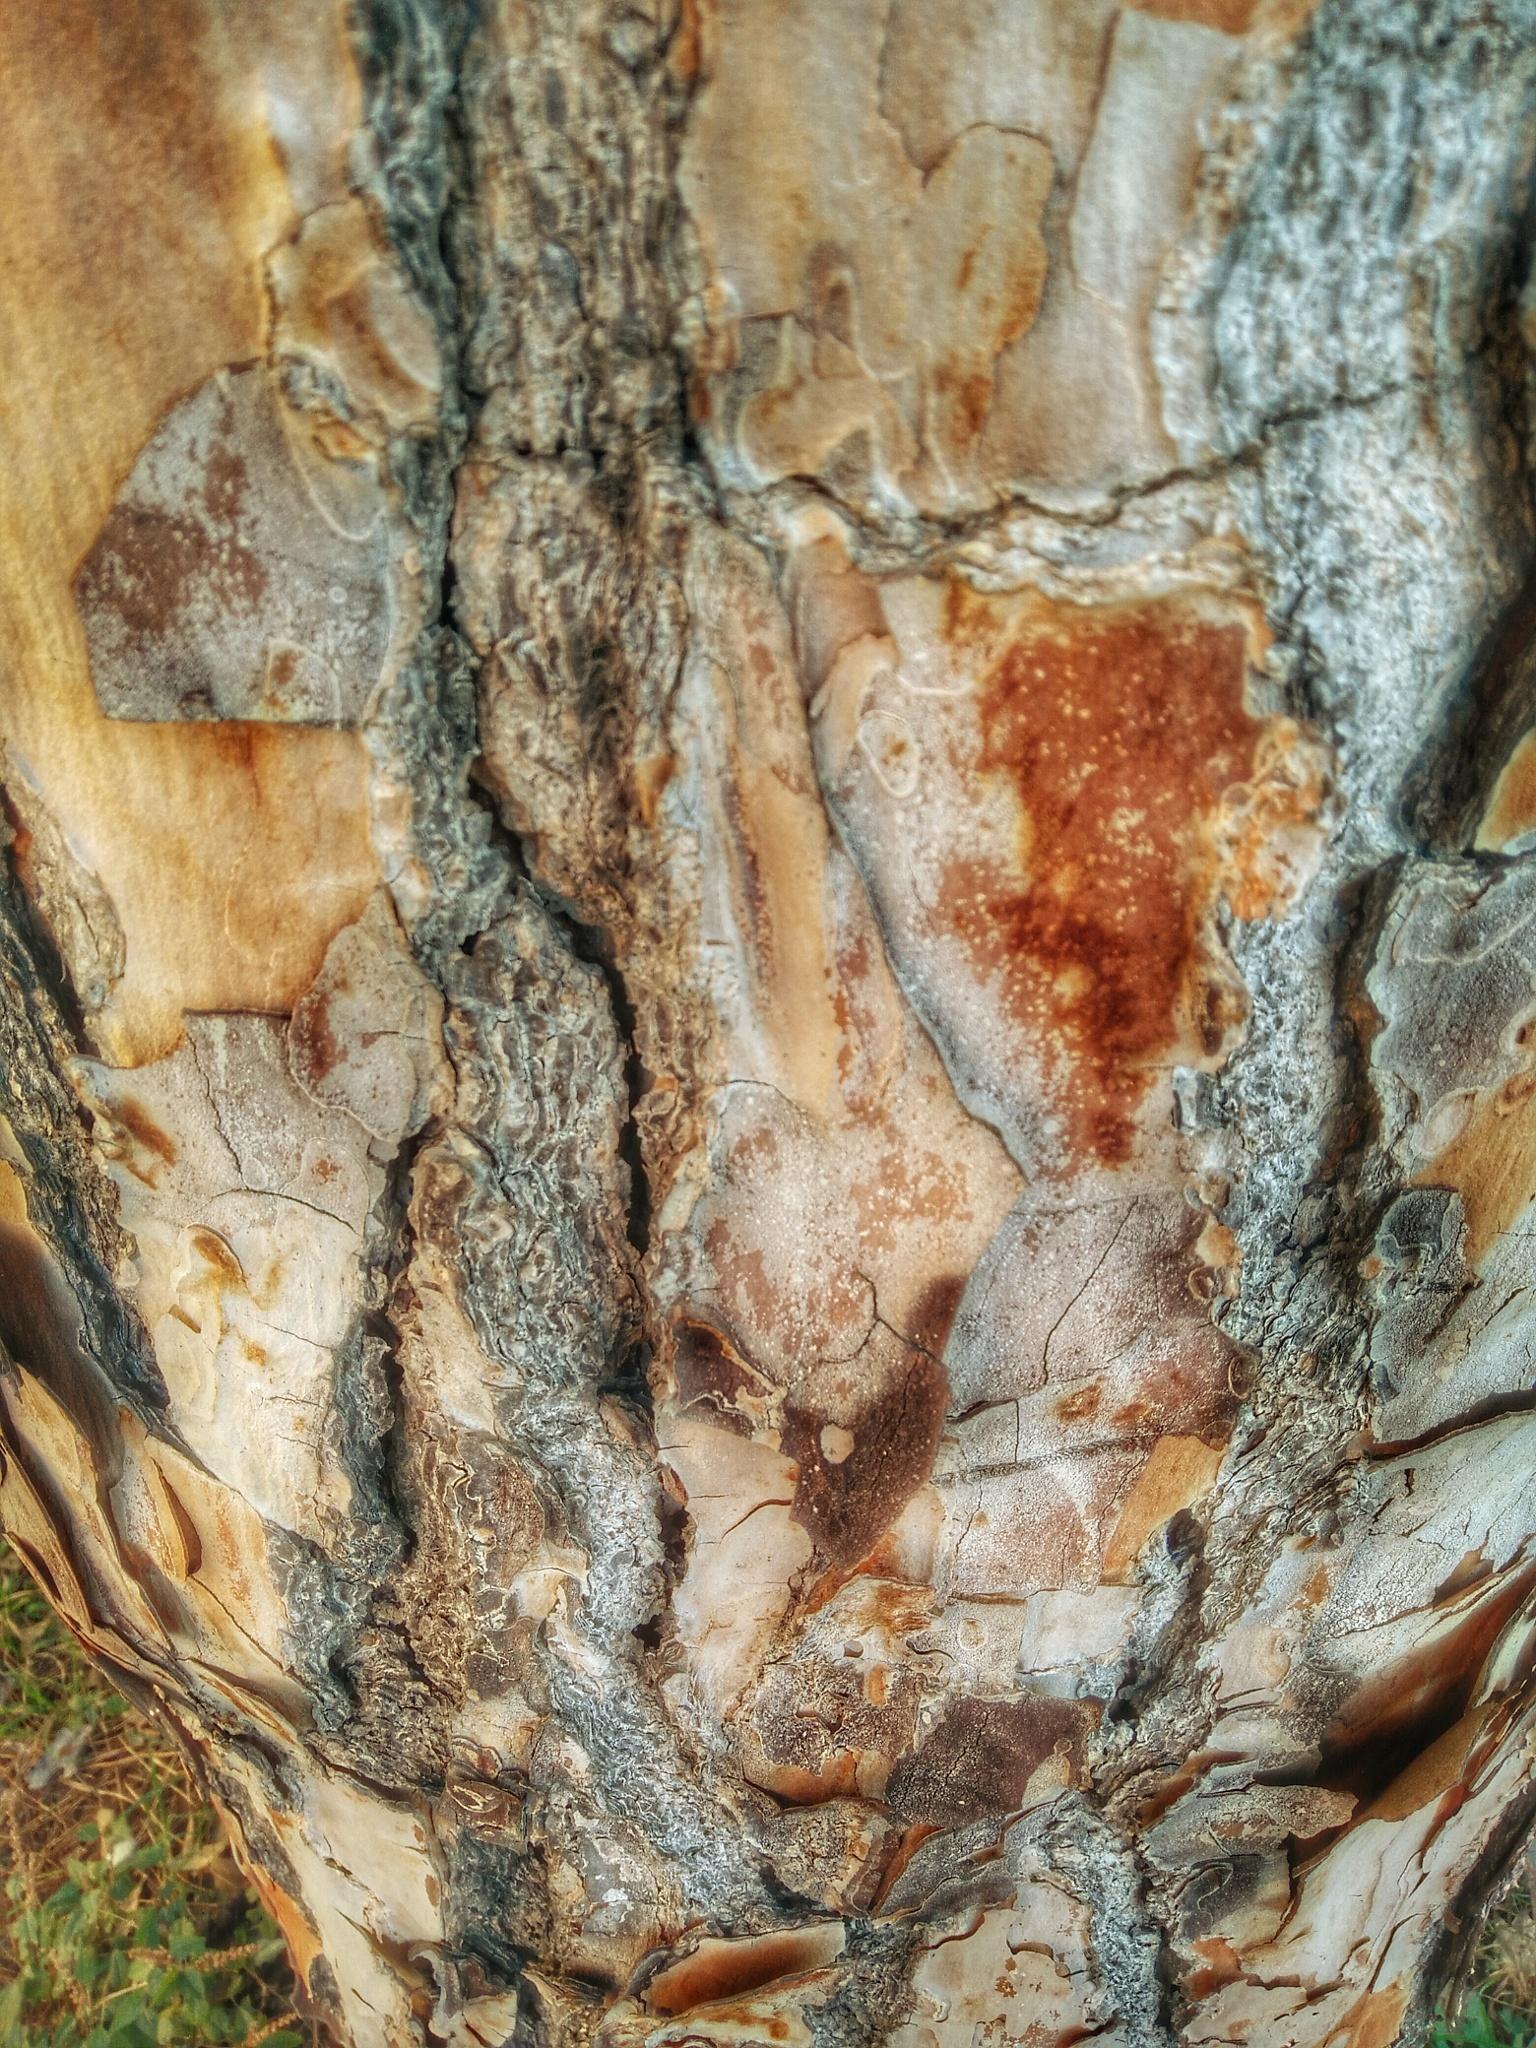 Age on a Tree by Fabio Pinna